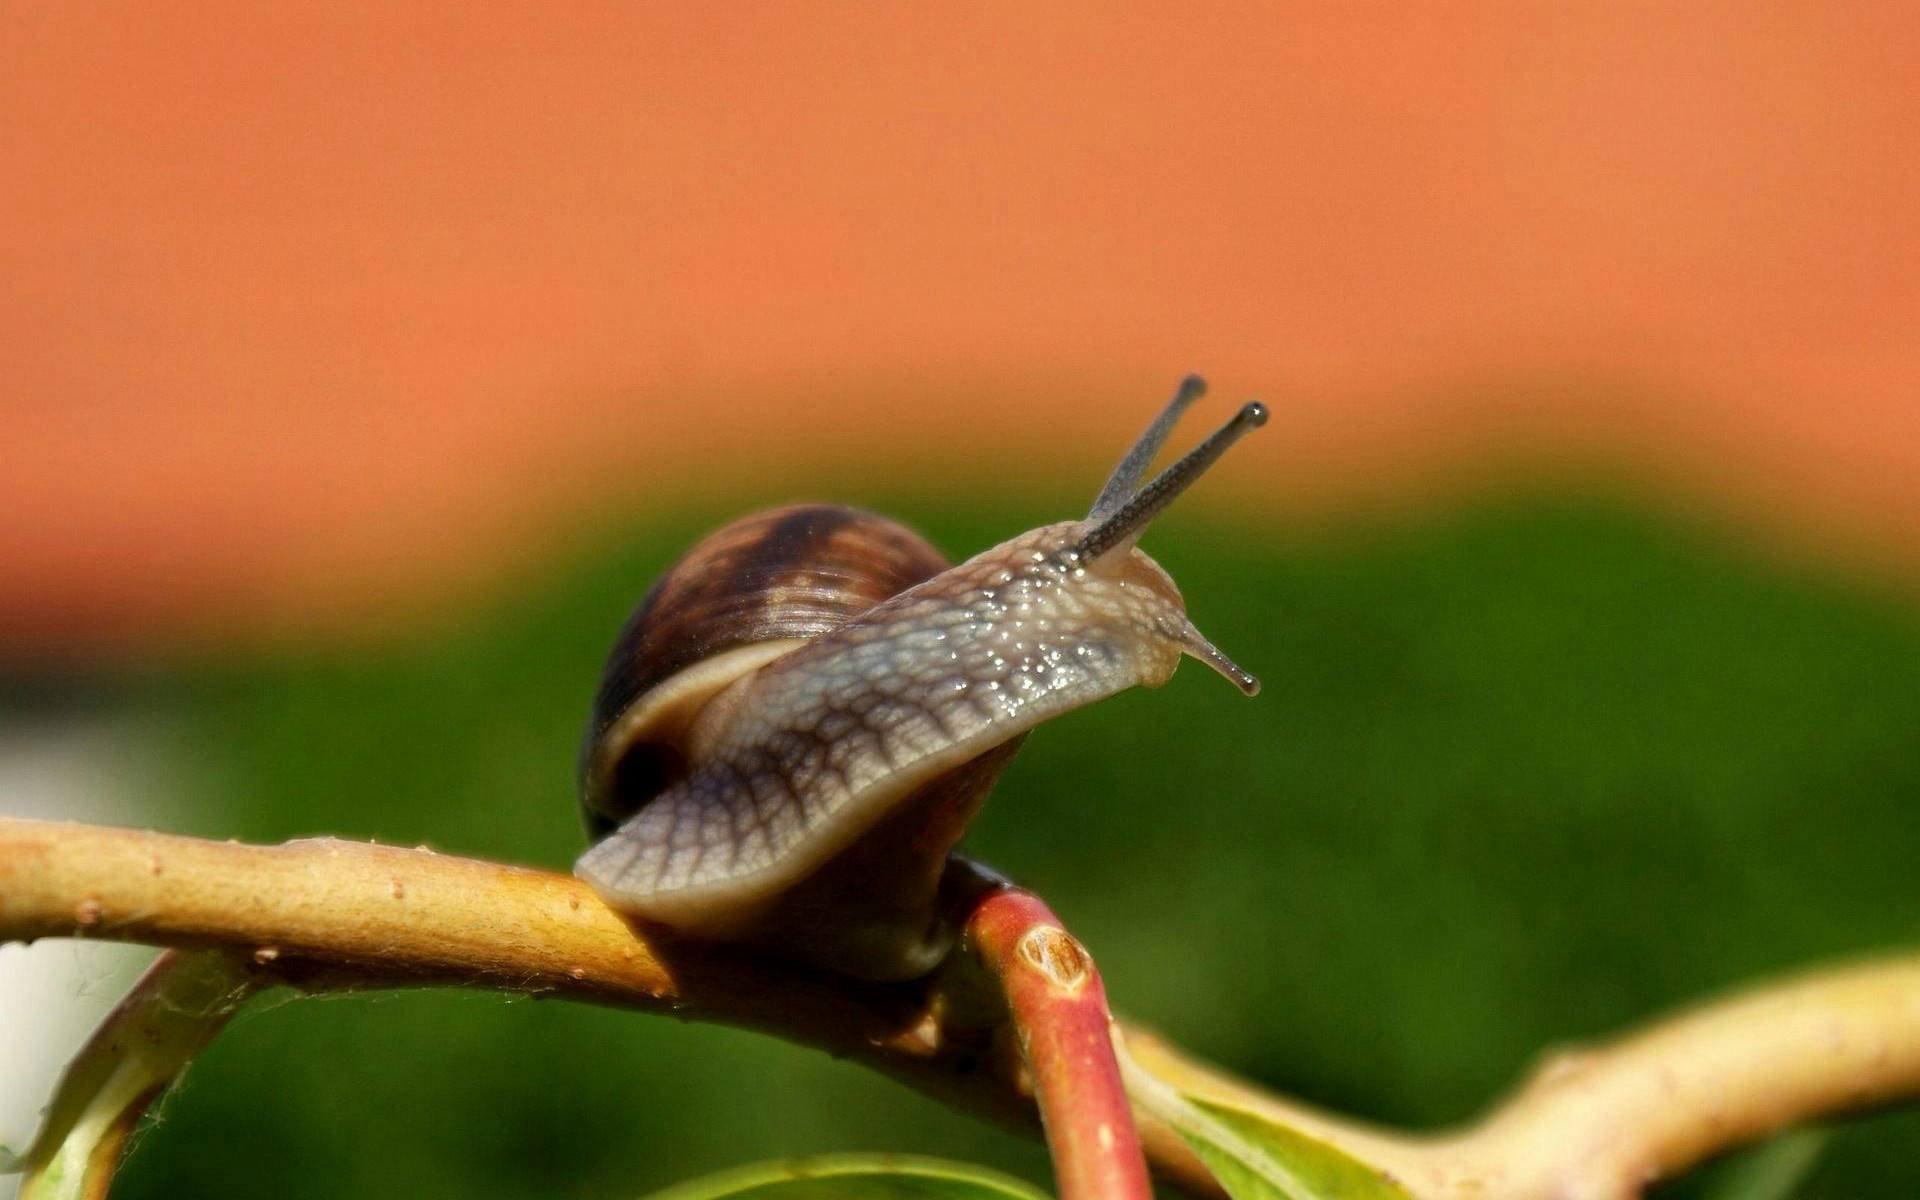 Animal Snail Macro Wallpaper Hd